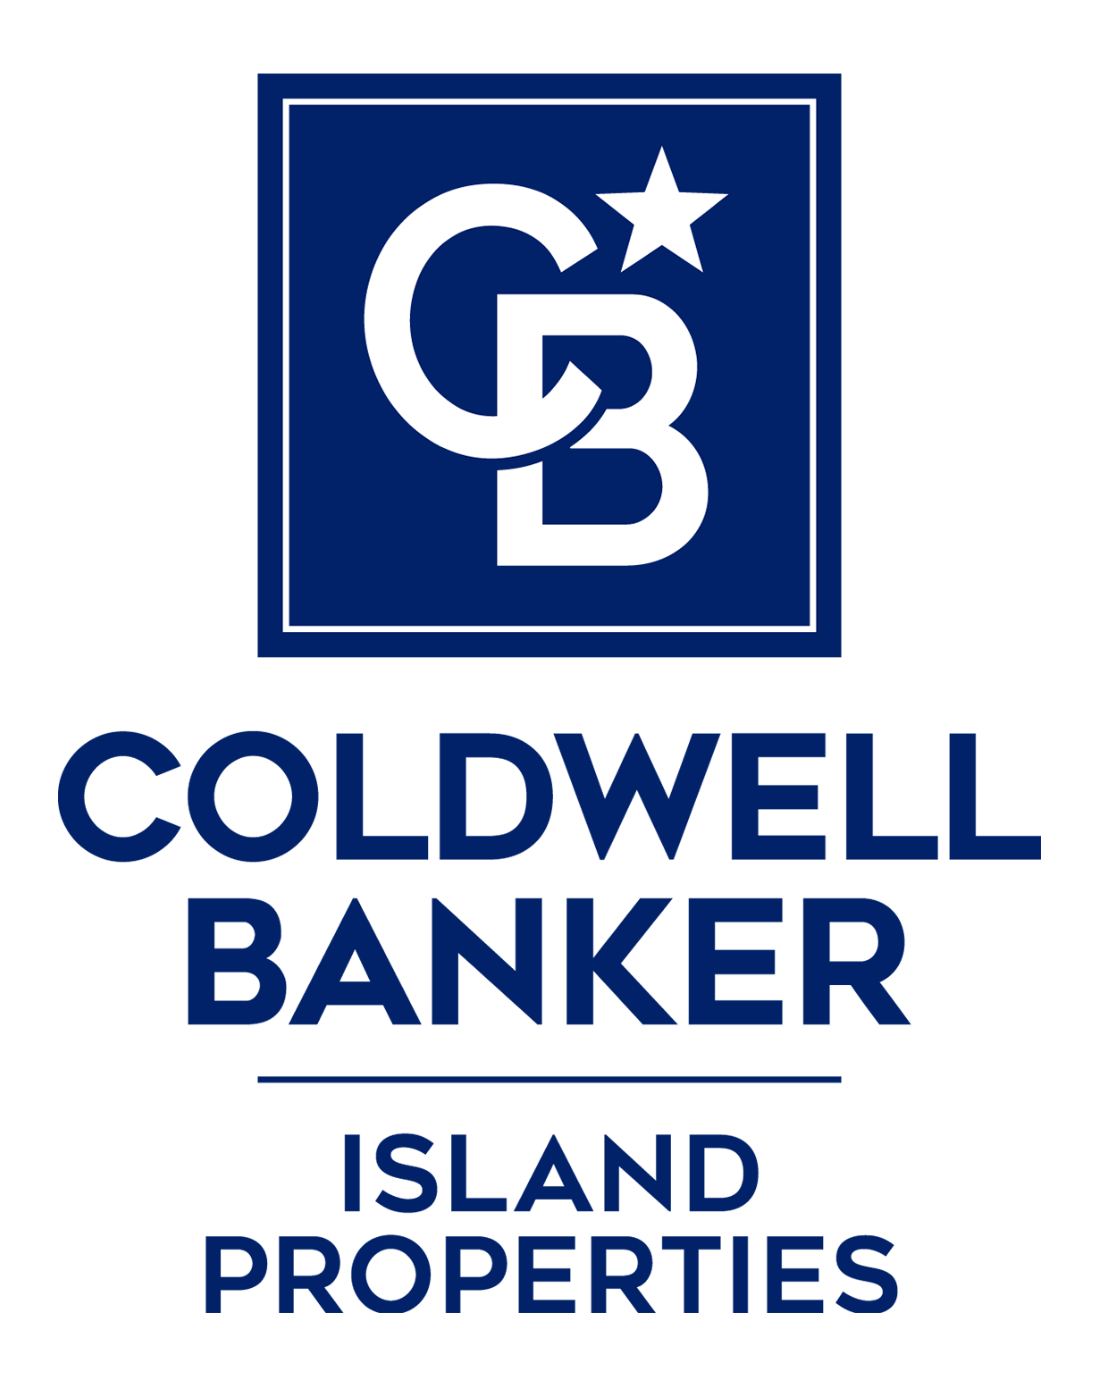 Elizabeth Wood - Coldwell Banker Island Properties Logo